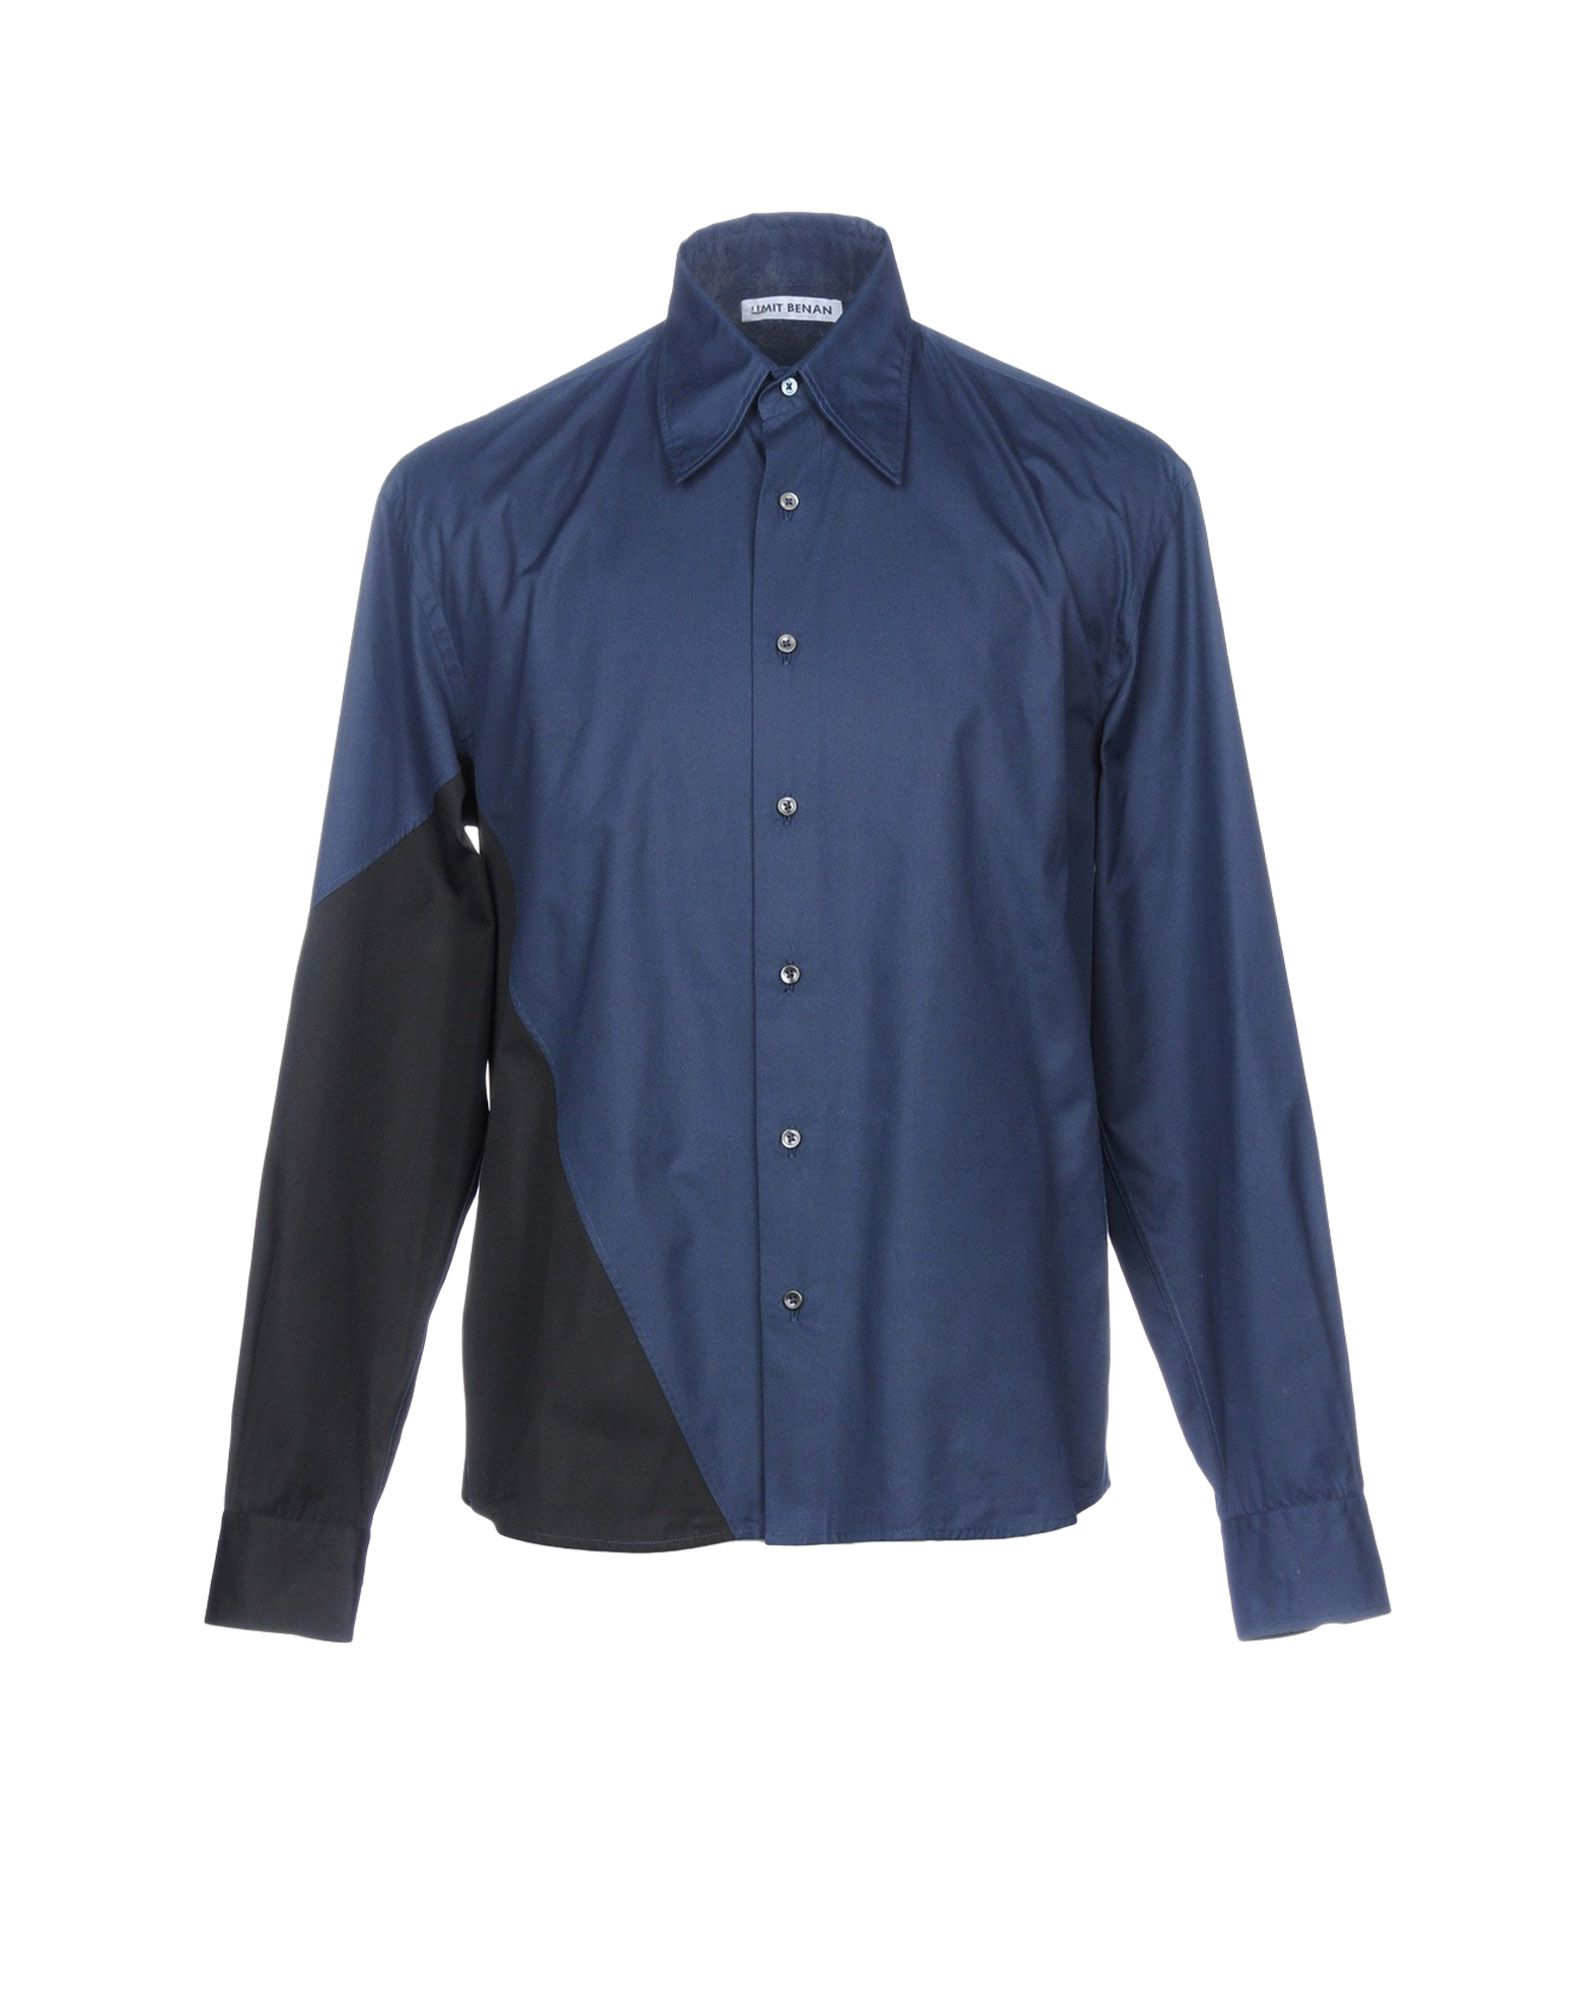 Camicia Tinta Unita Umit Benan Uomo - Acquista online su